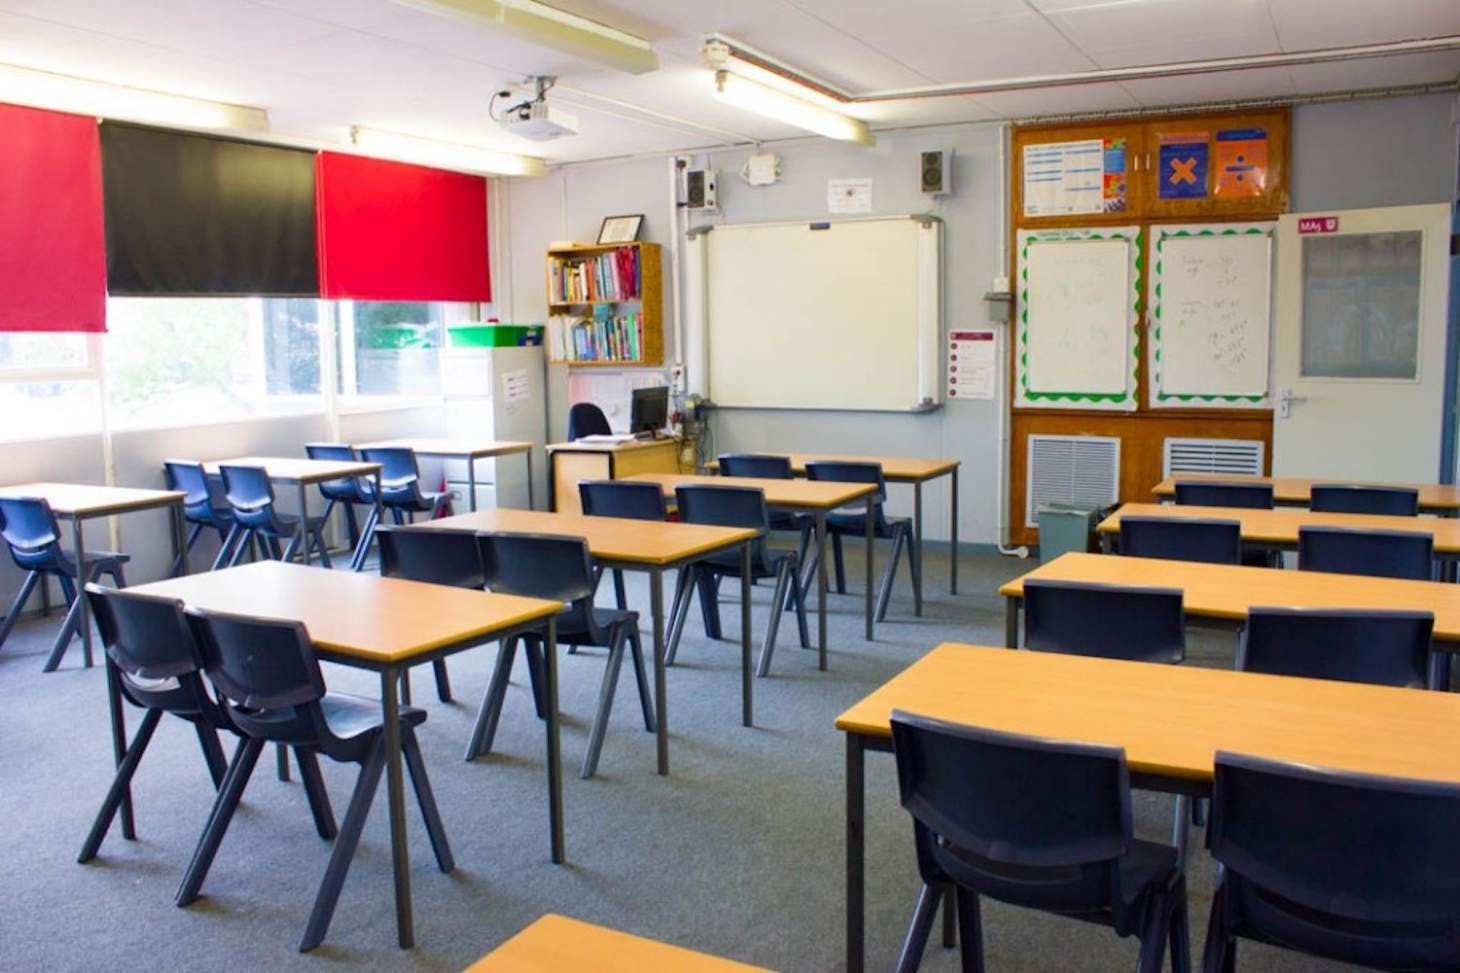 Haileybury Turnford School Classroom space hire